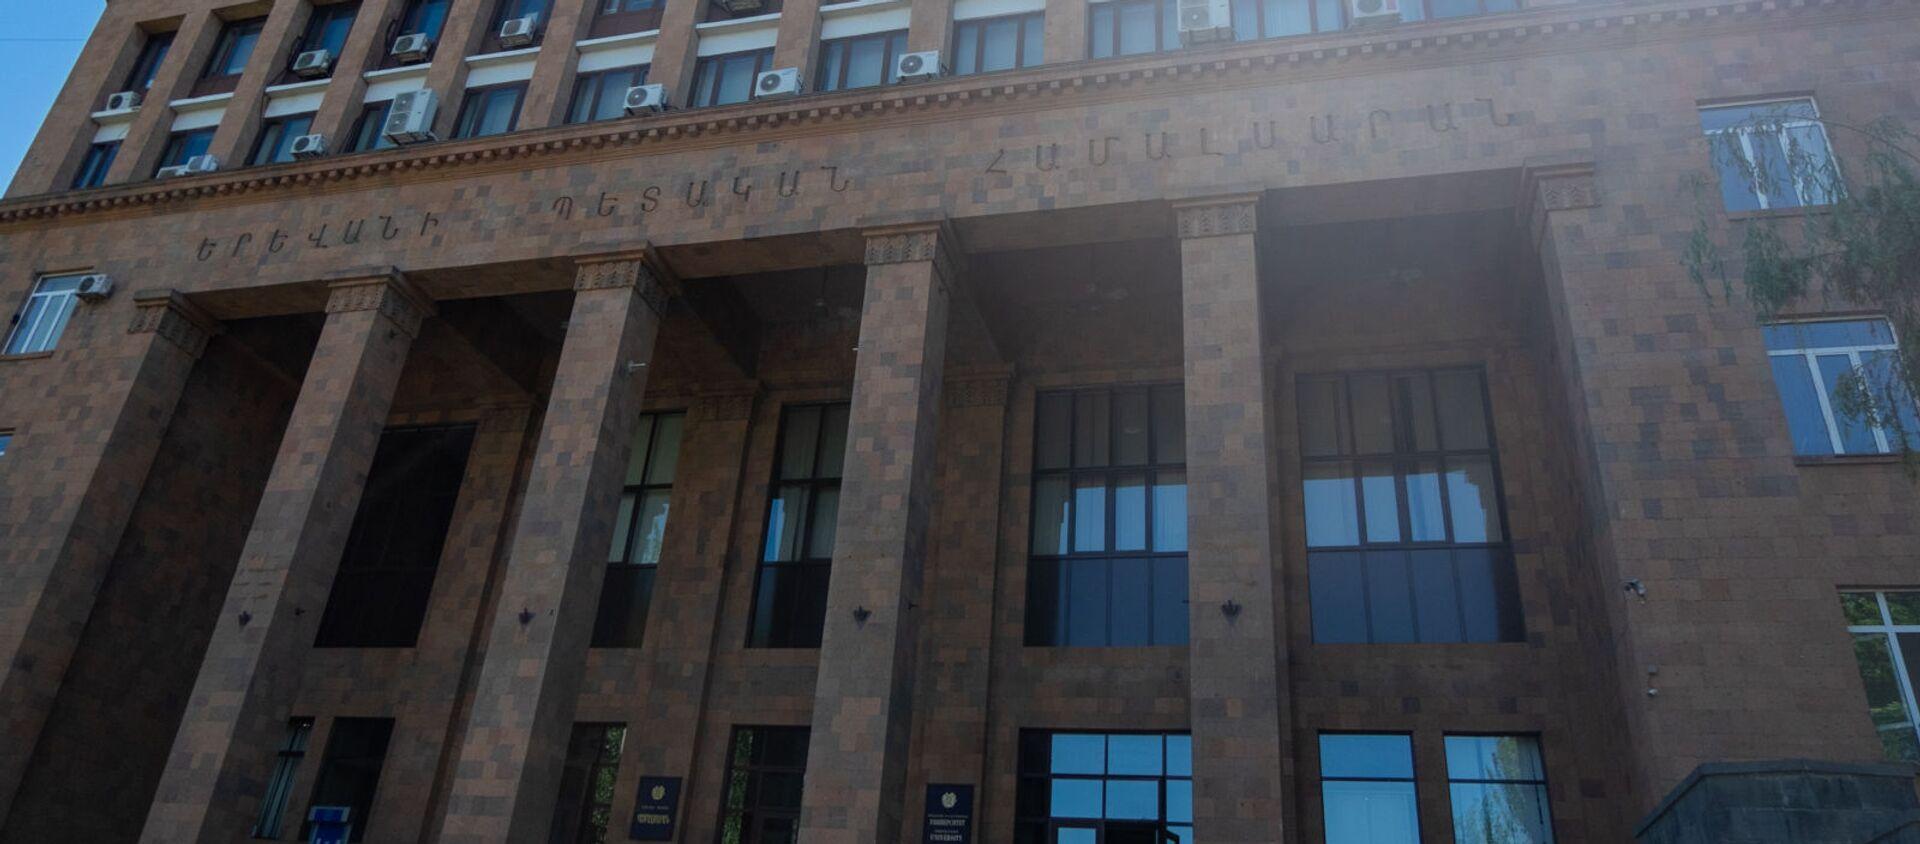 Ереванский государственный университет - Sputnik Արմենիա, 1920, 24.03.2021